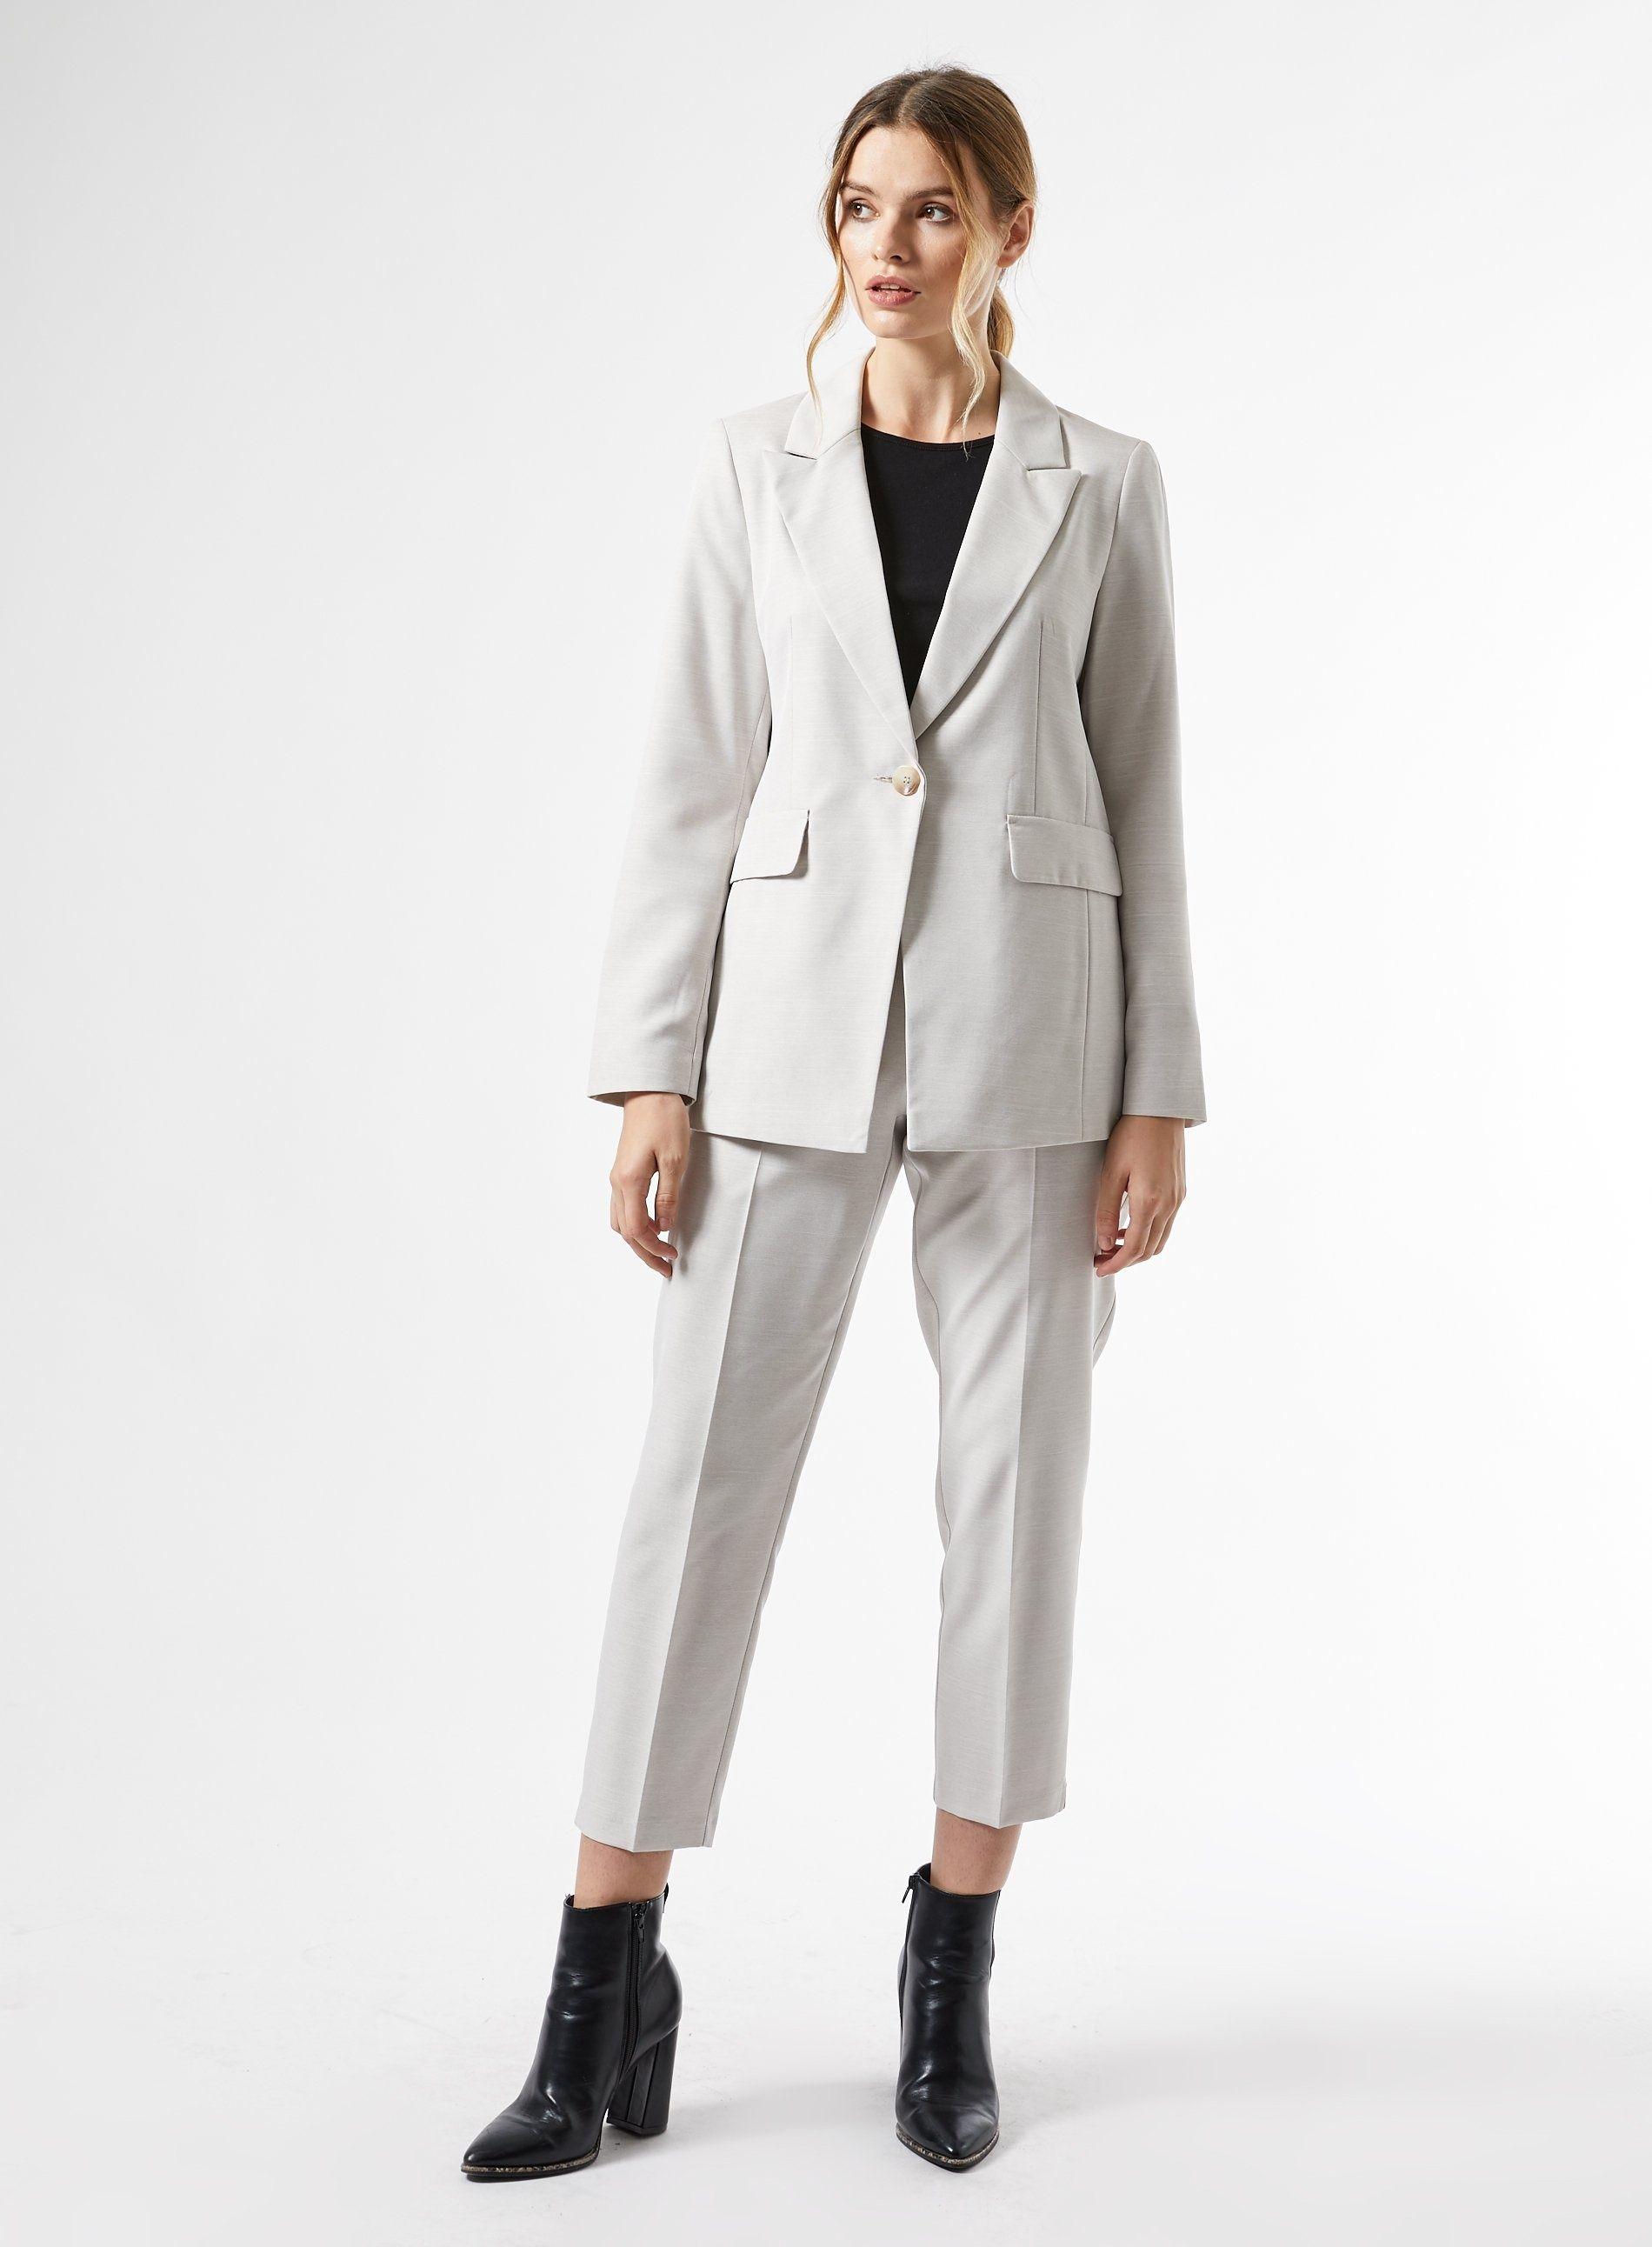 Dorothy Perkins Womens Grey Blazer Jacket Long Sleeve Collar Outerwear Top